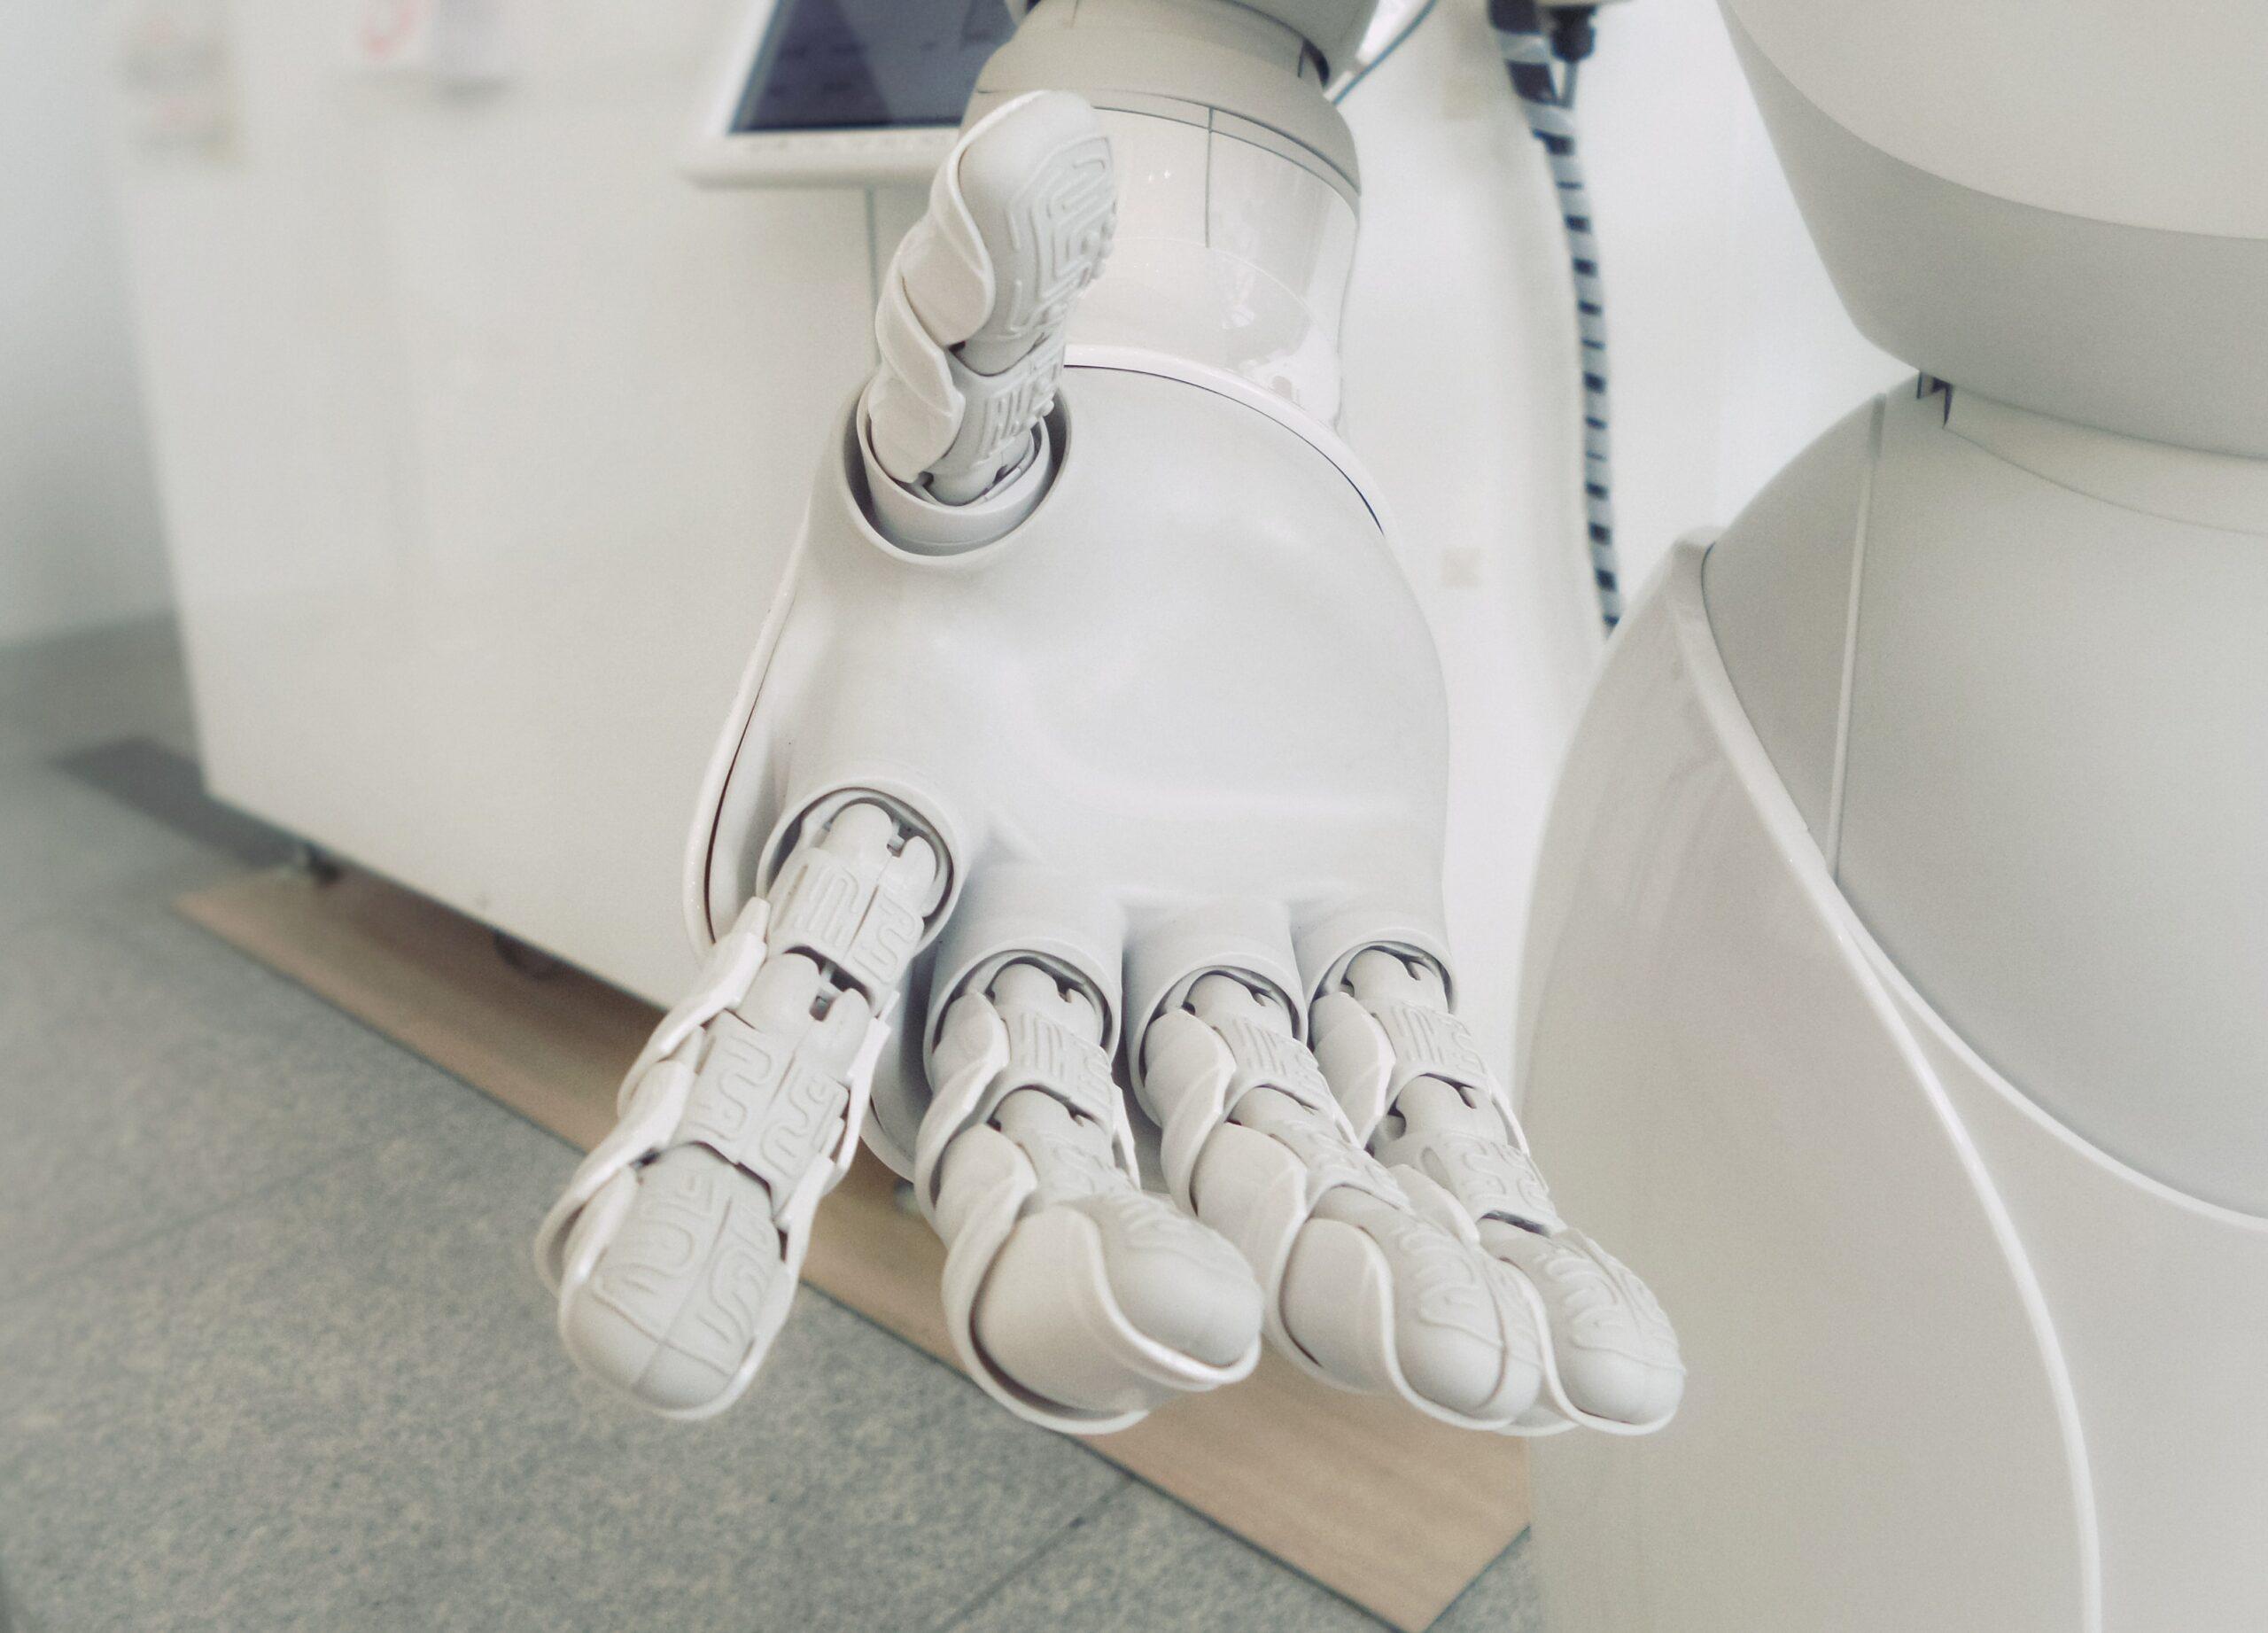 Robotic Process Automation Analyst